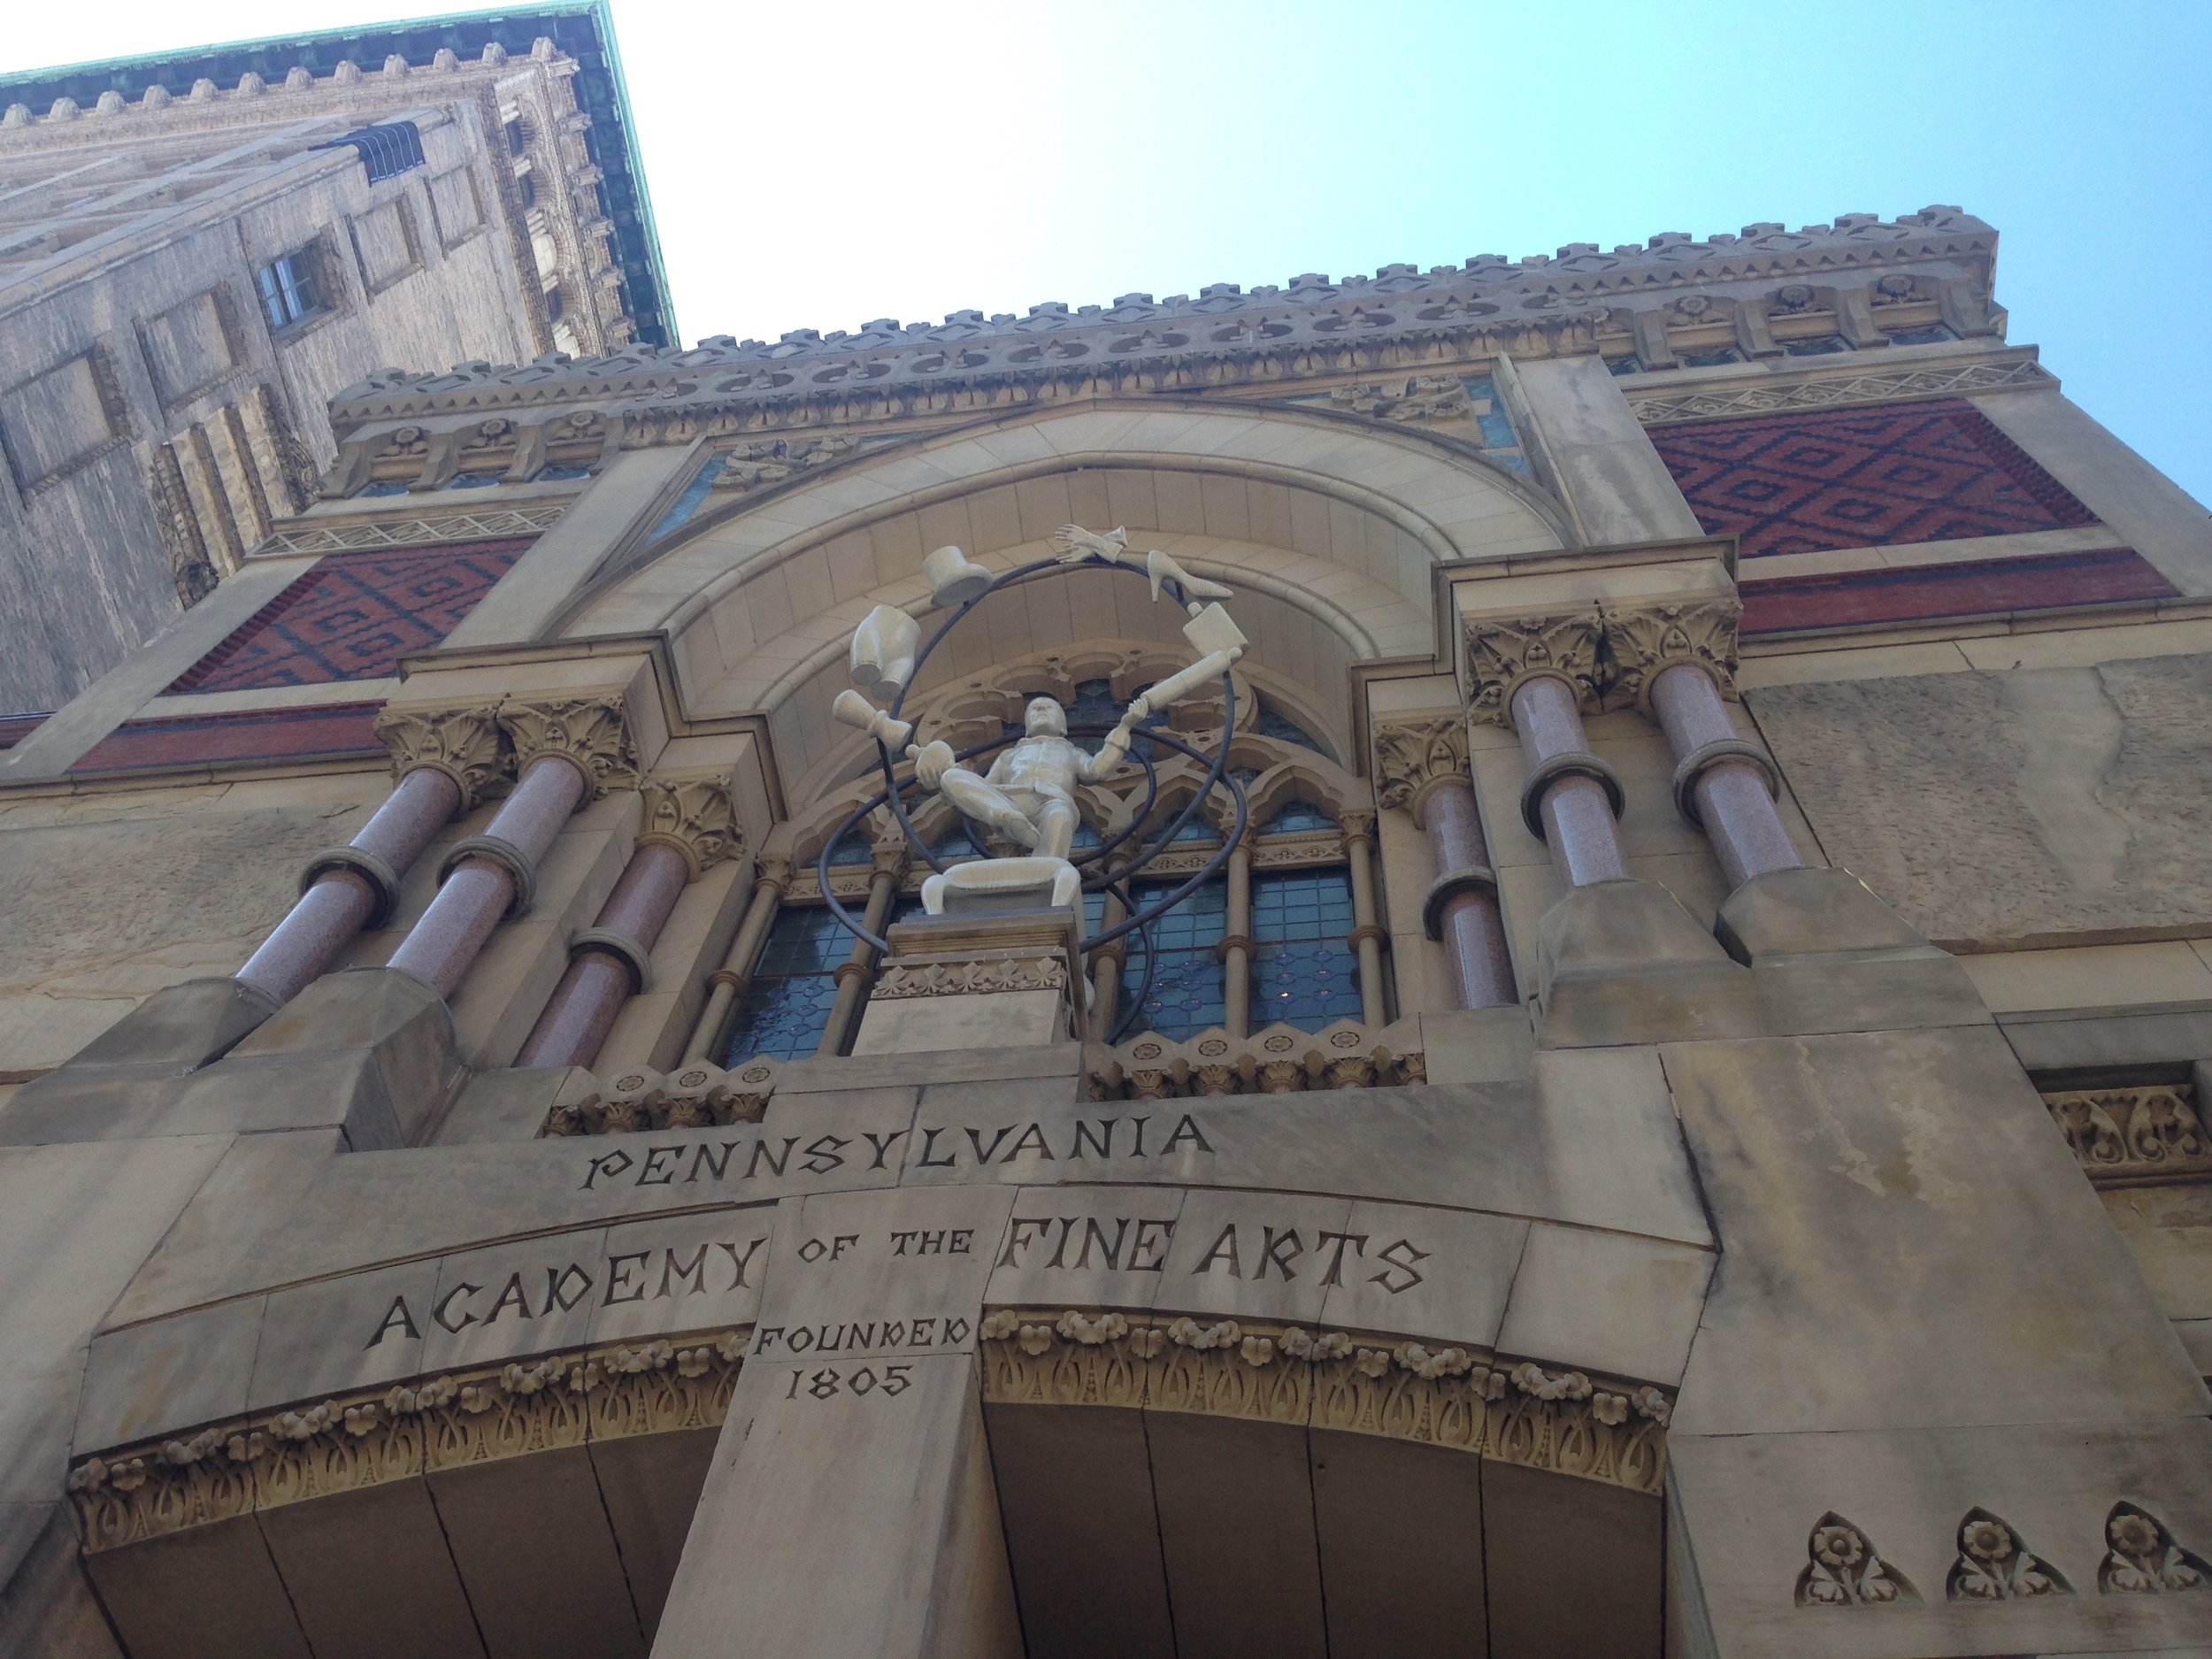 Philadelphia Academy of Fine Art - Wonderful collection!